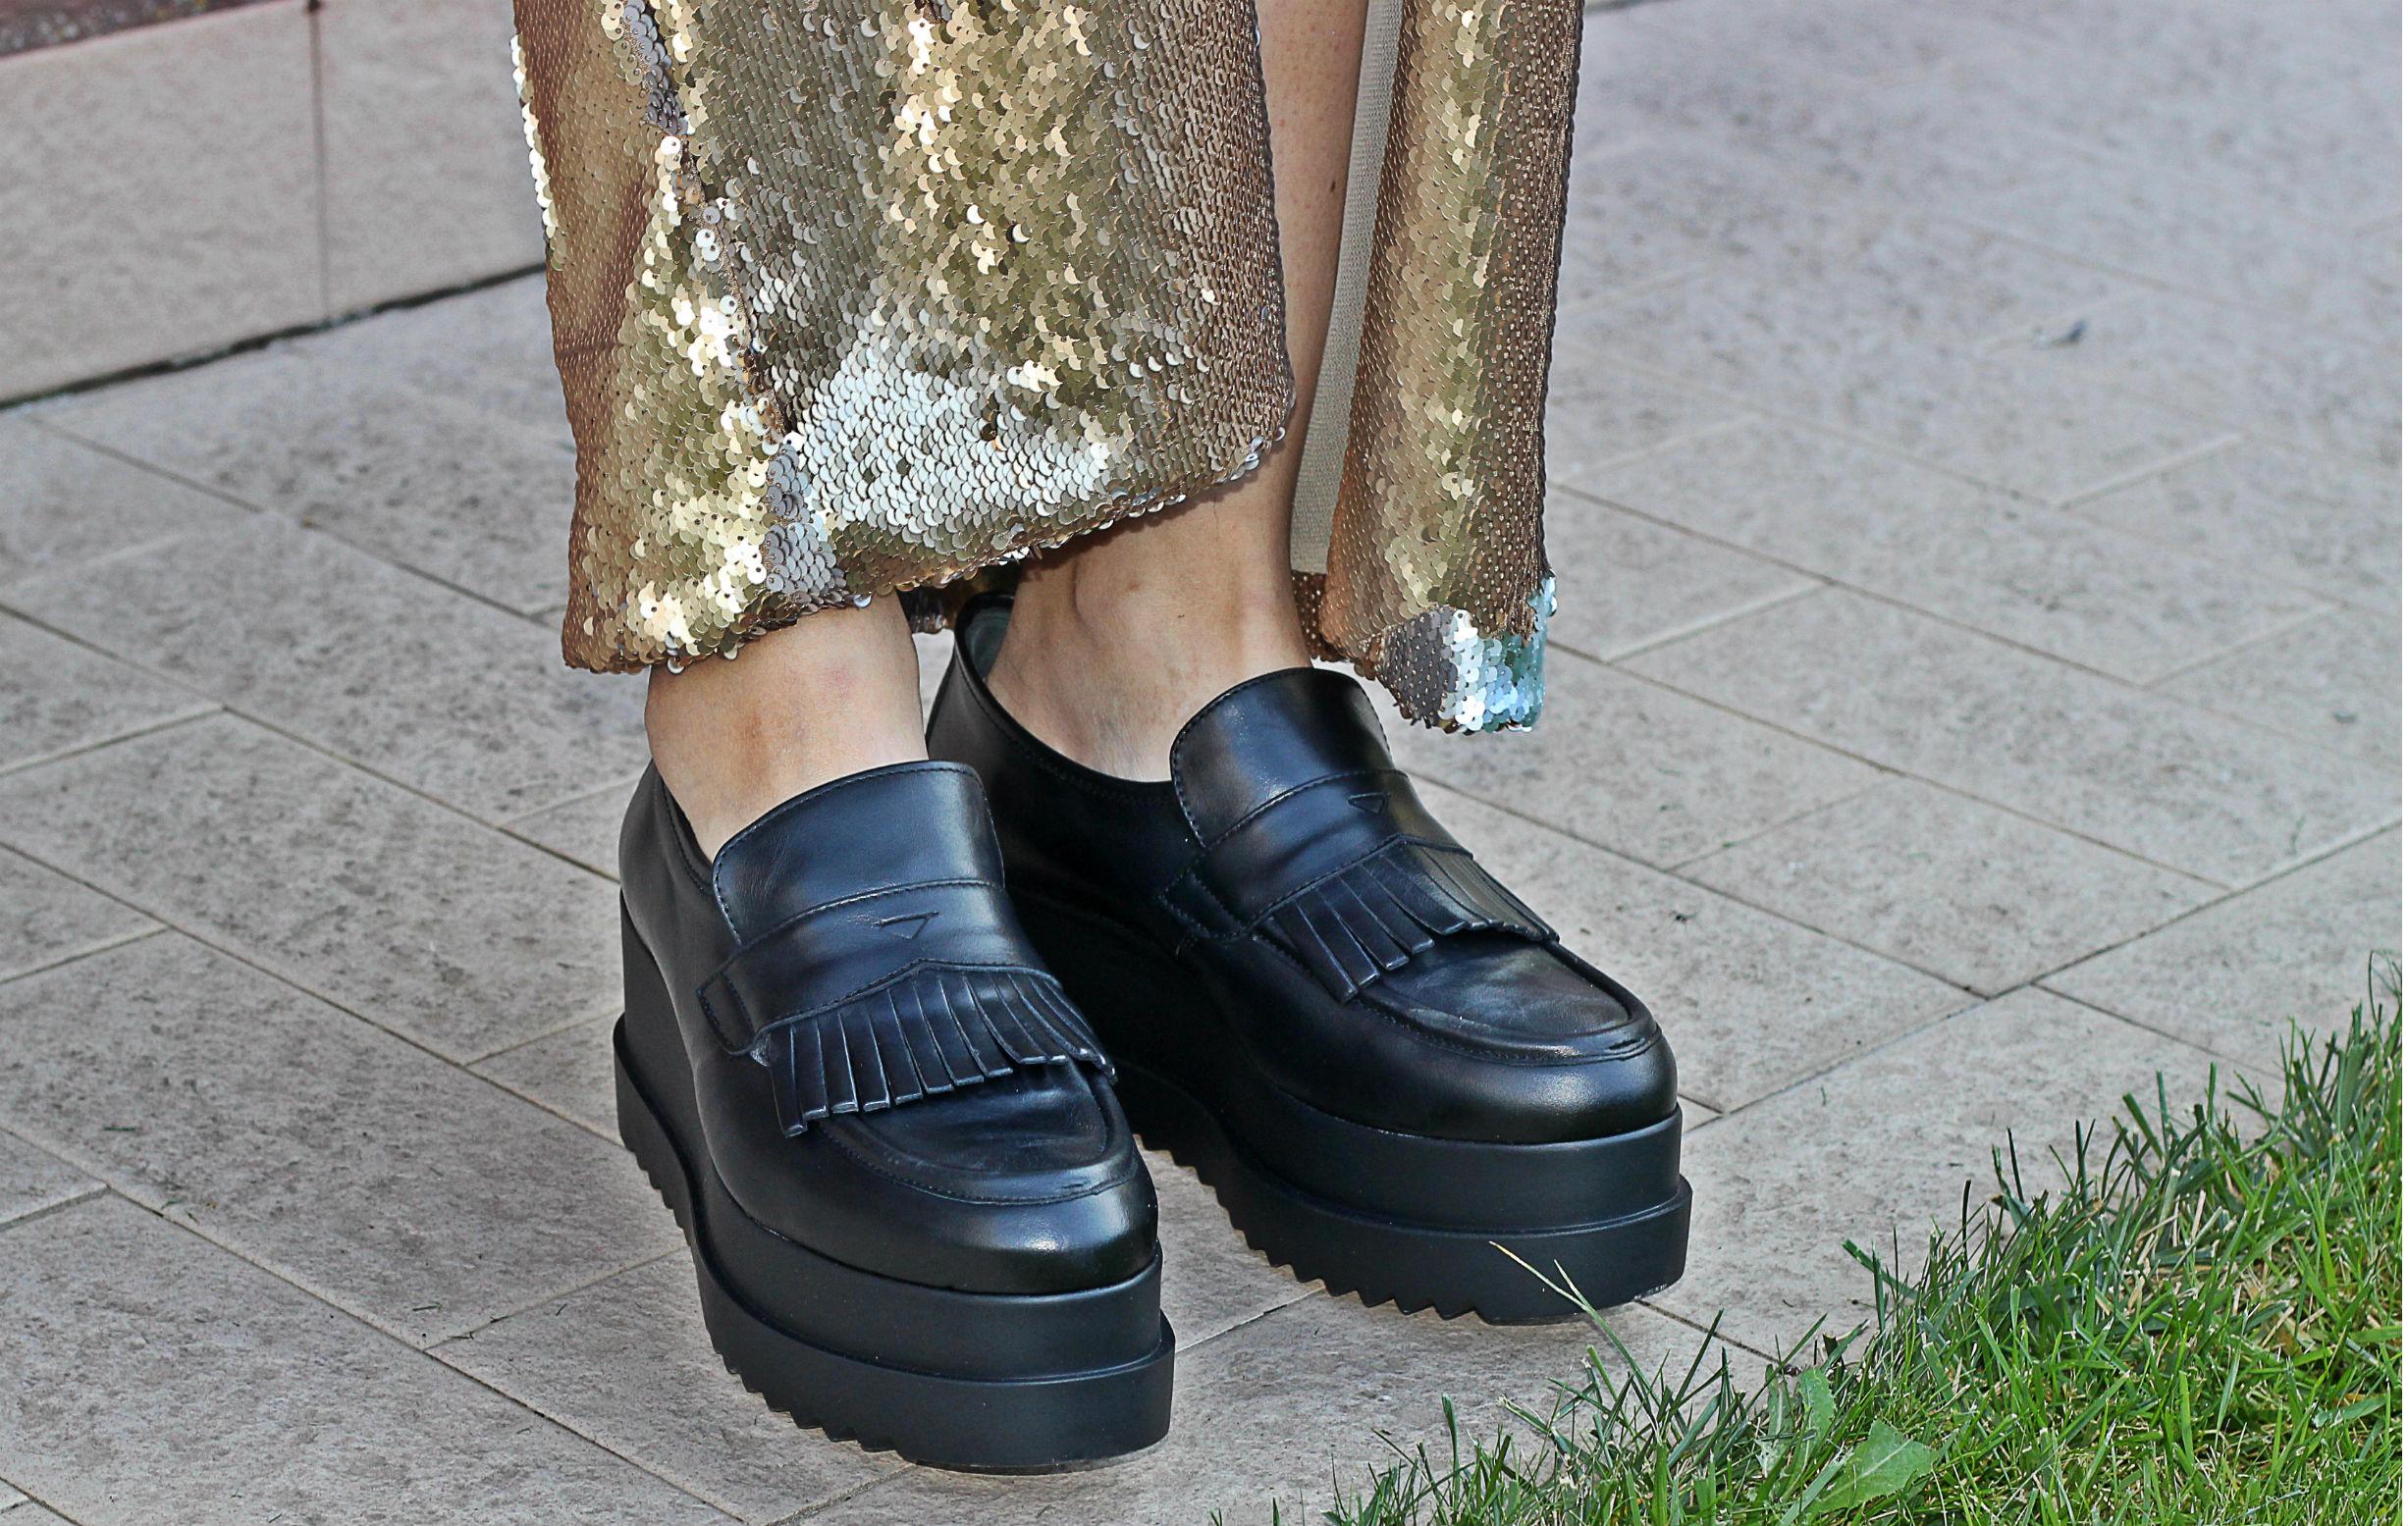 elisabetta bertolini - mocassino zeppa e frange nila e nila made in italy shoes - scarpe italiane